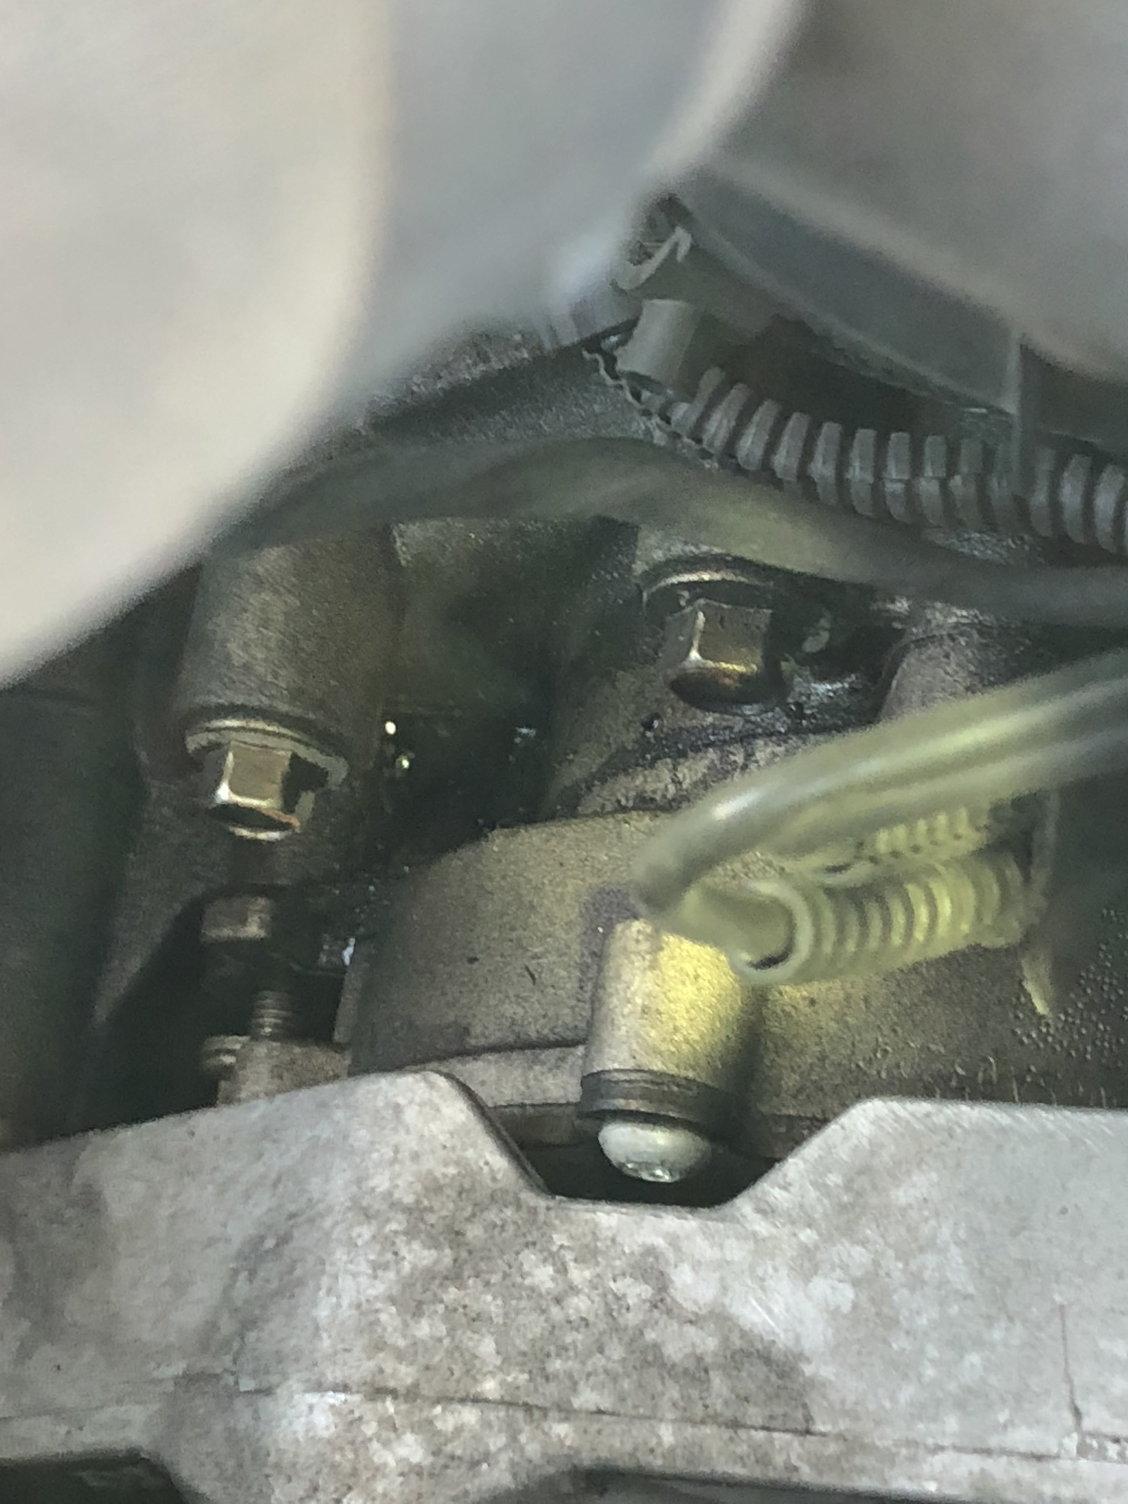 6.7 Powerstroke Oil Change >> 2011 F250 Oil leak!!! Need help - Ford Truck Enthusiasts ...